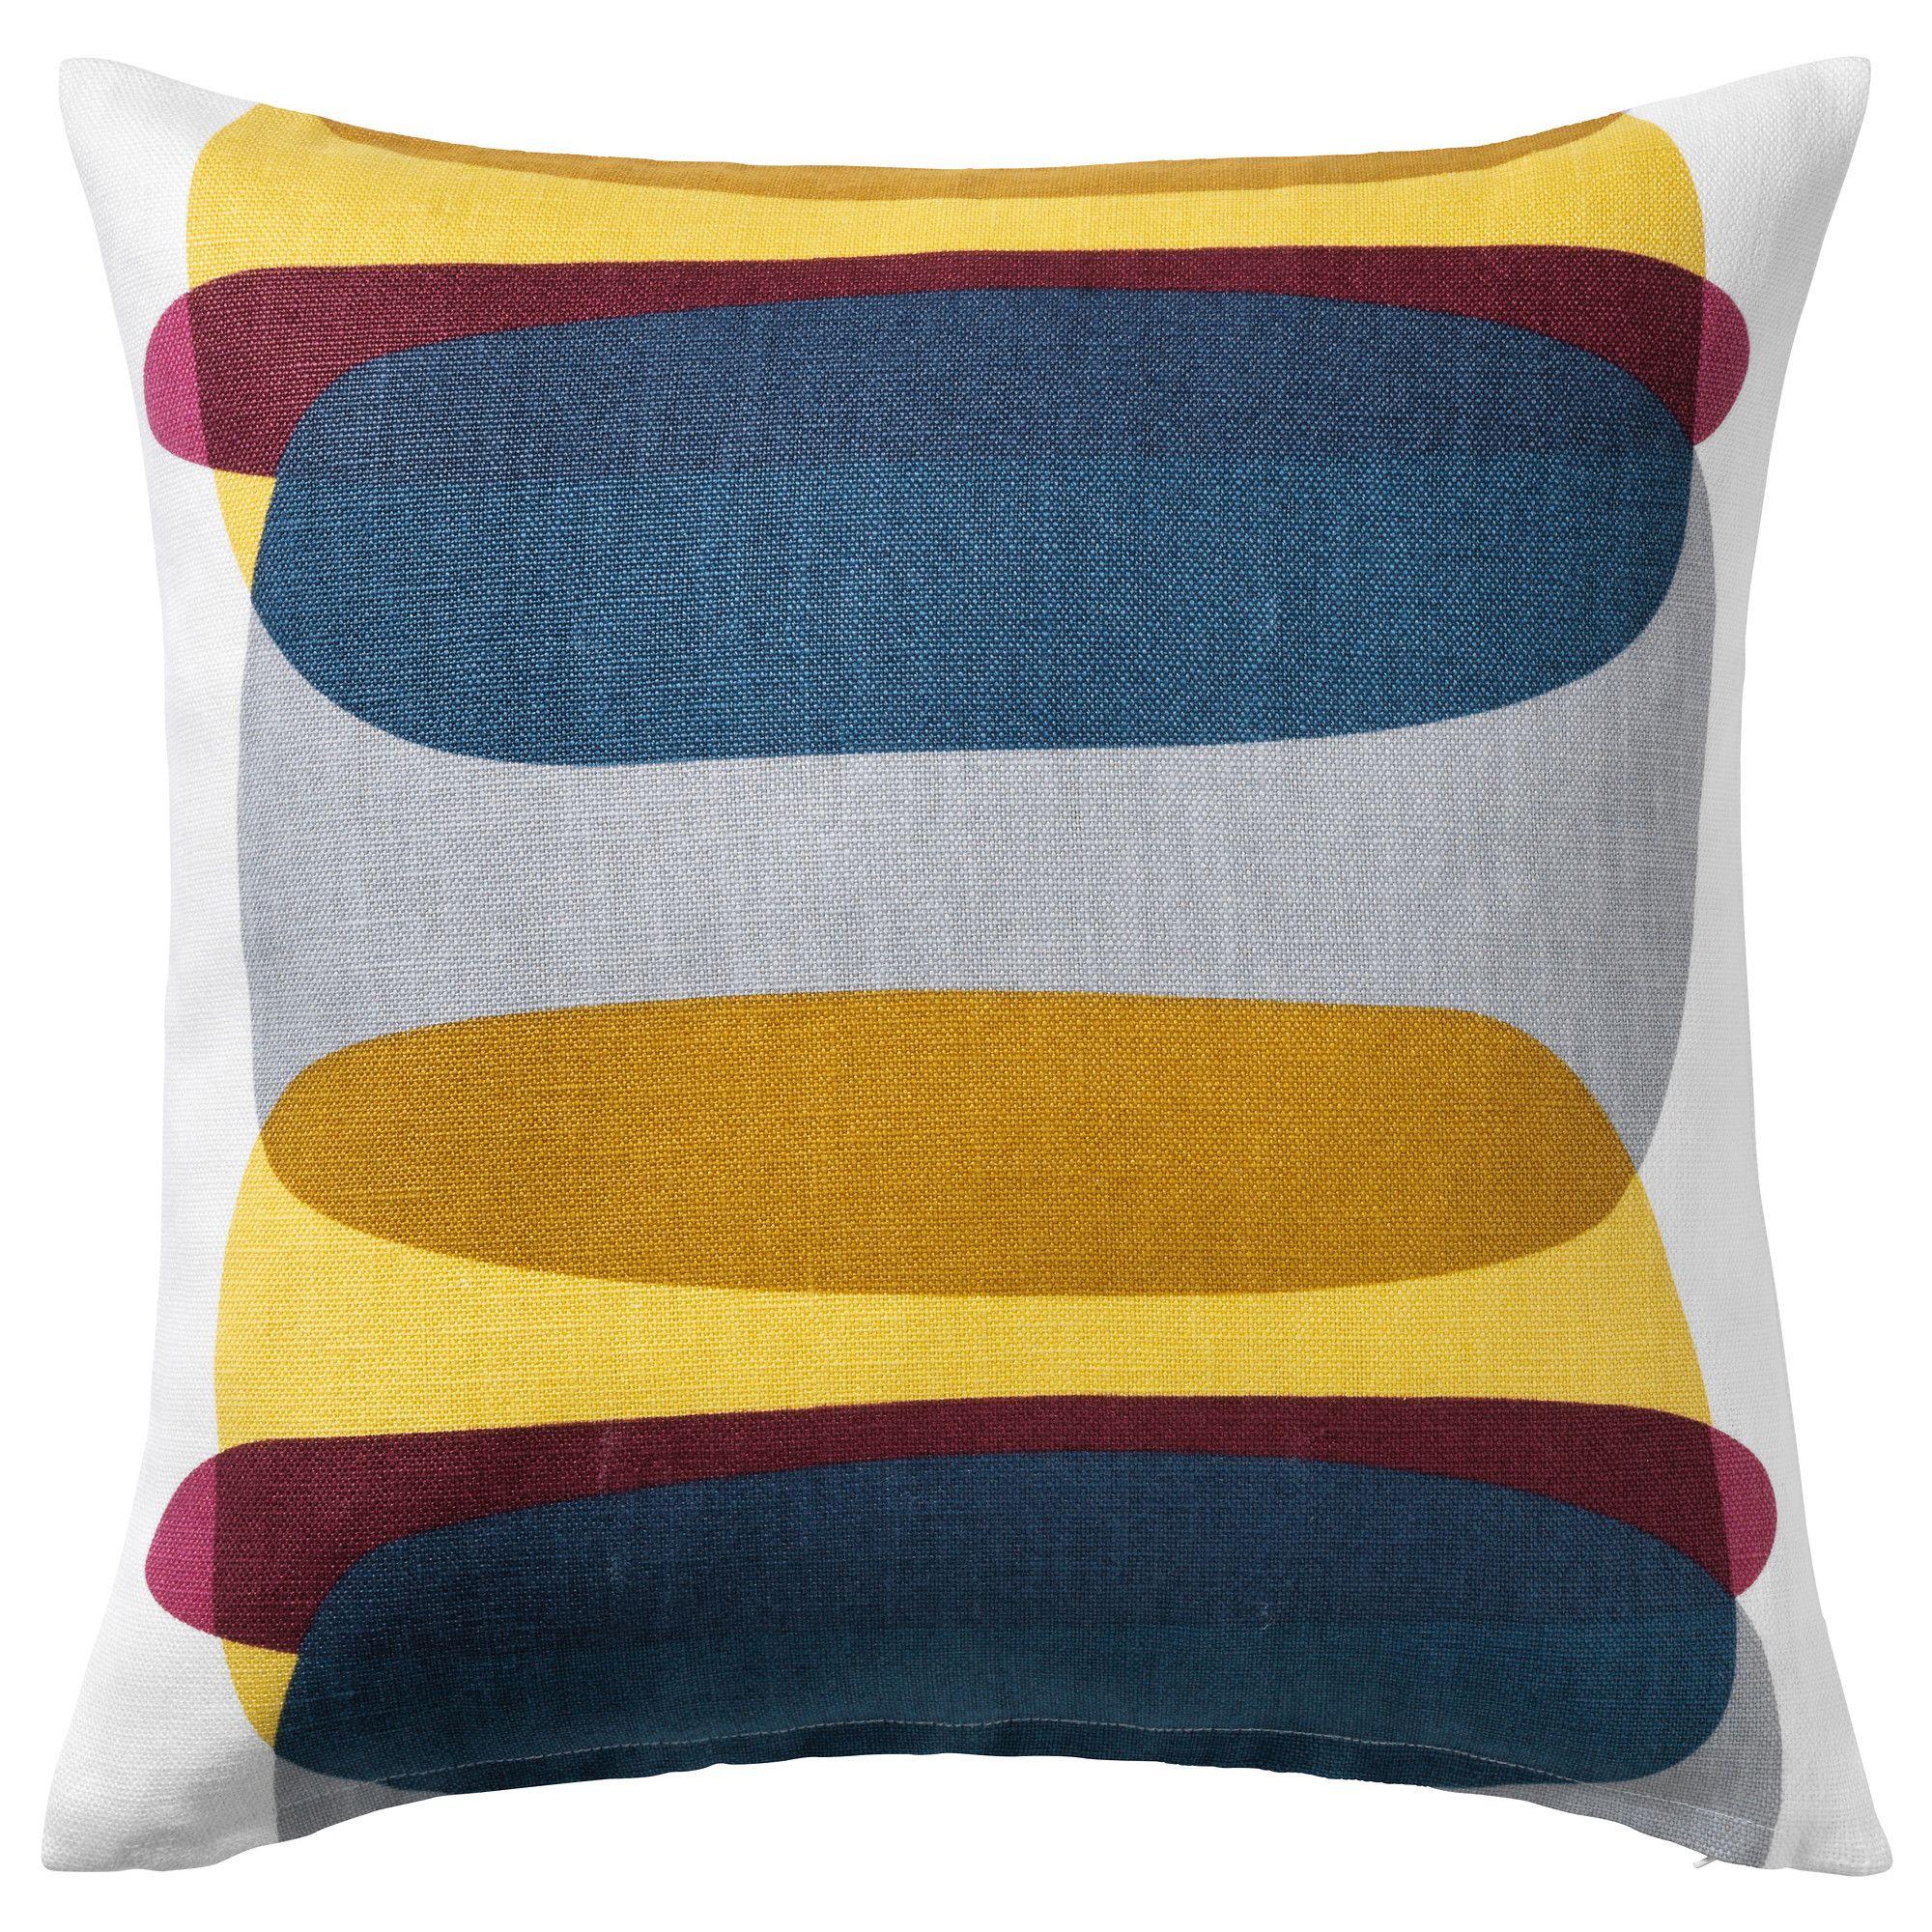 MALIN FIGUR Cushion Cover Blue/grey/yellow 50x50 Cm